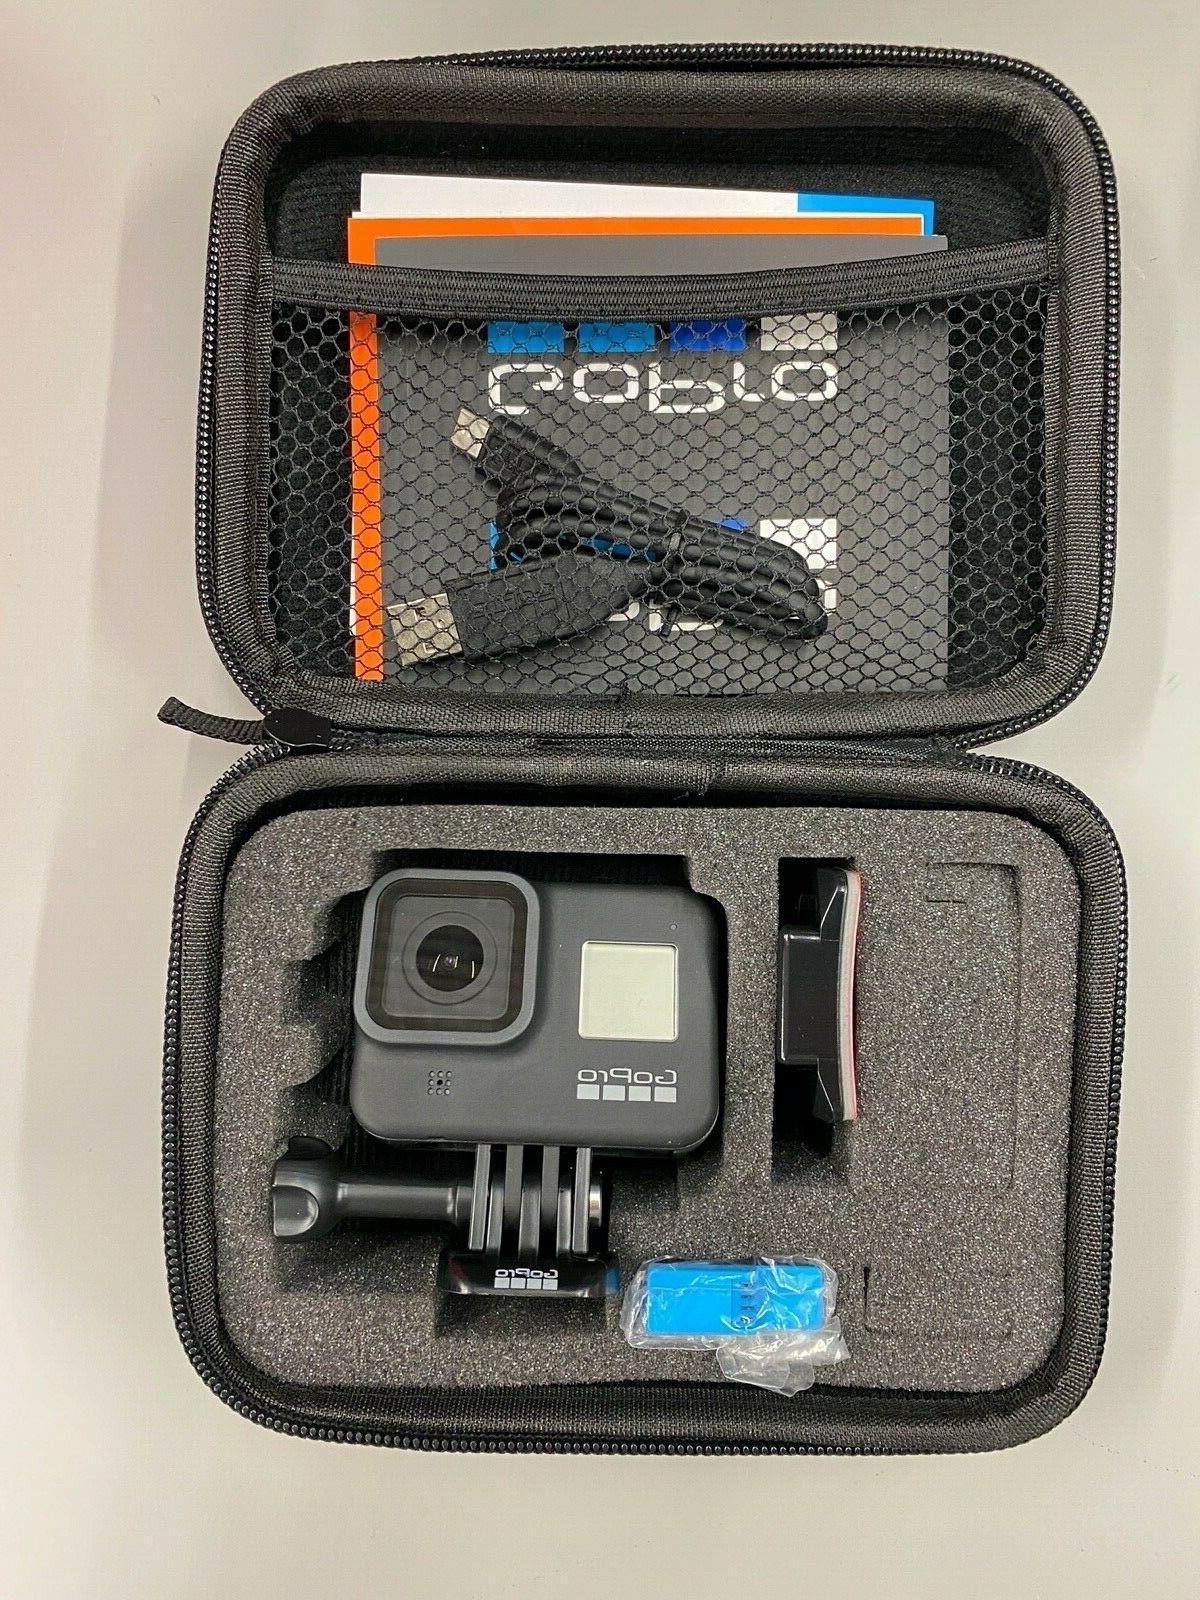 hero8 black waterproof action camera touch screen